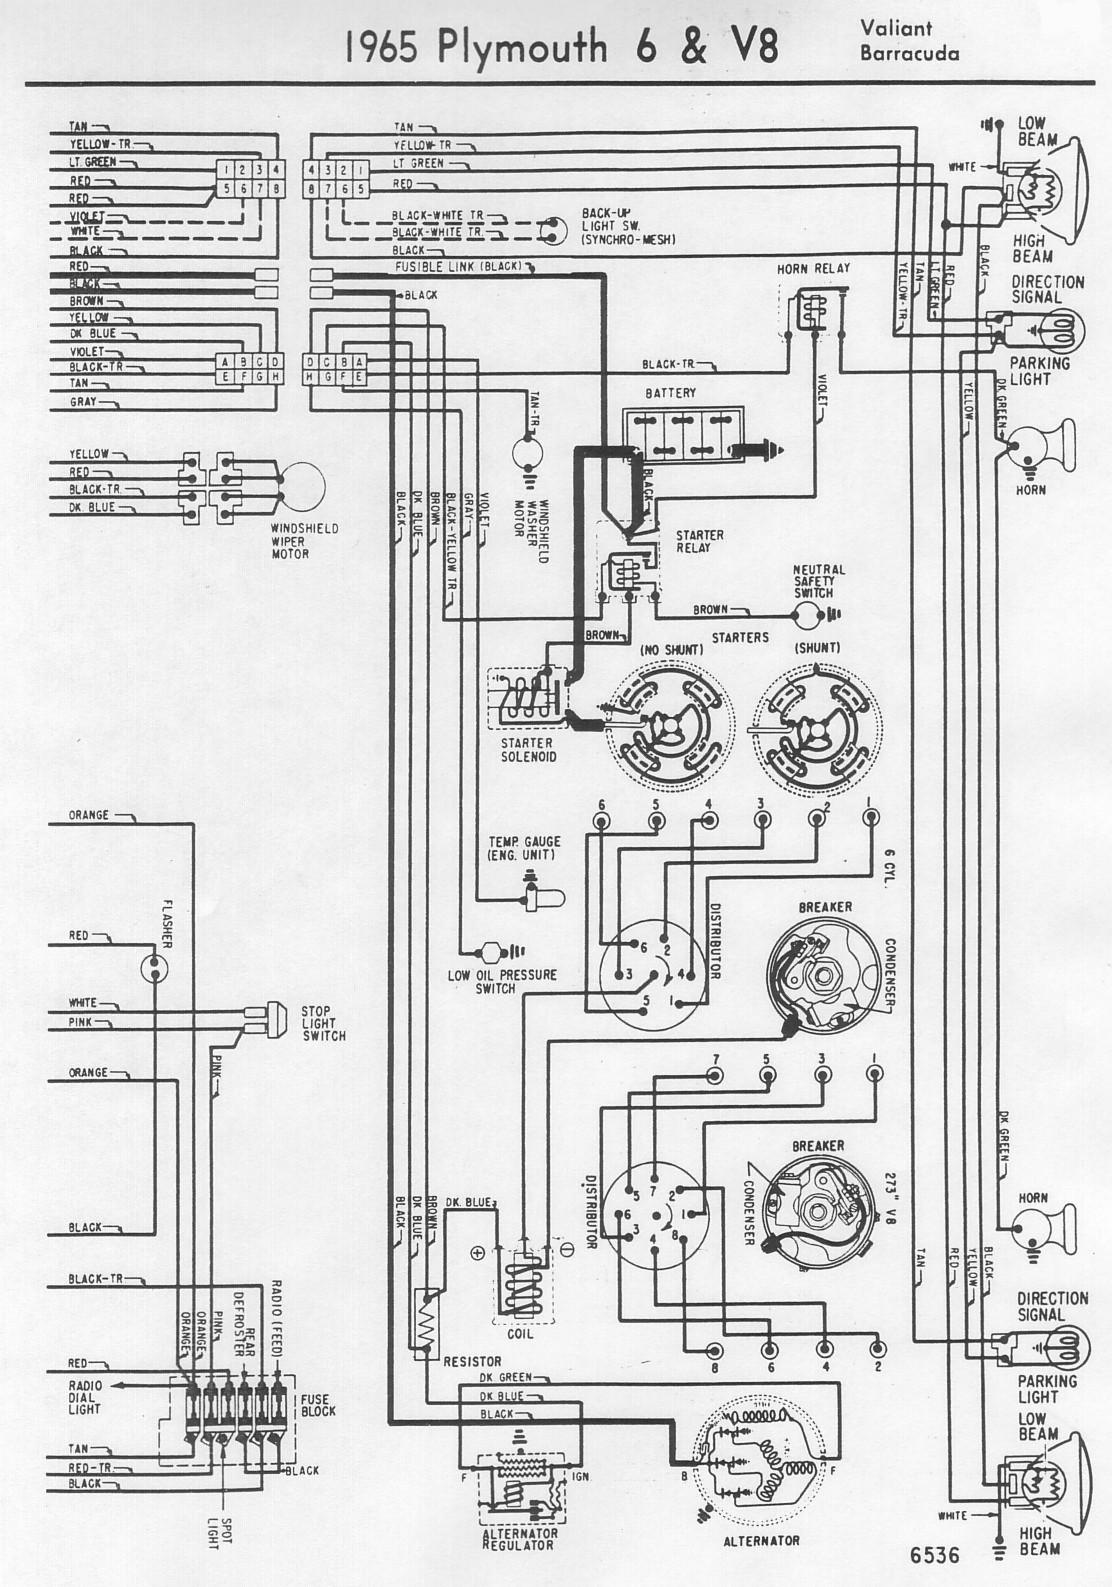 69 1967 gtx wiring diagram | wiring diagram plymouth fury wiring diagram  on 69 plymouth duster,